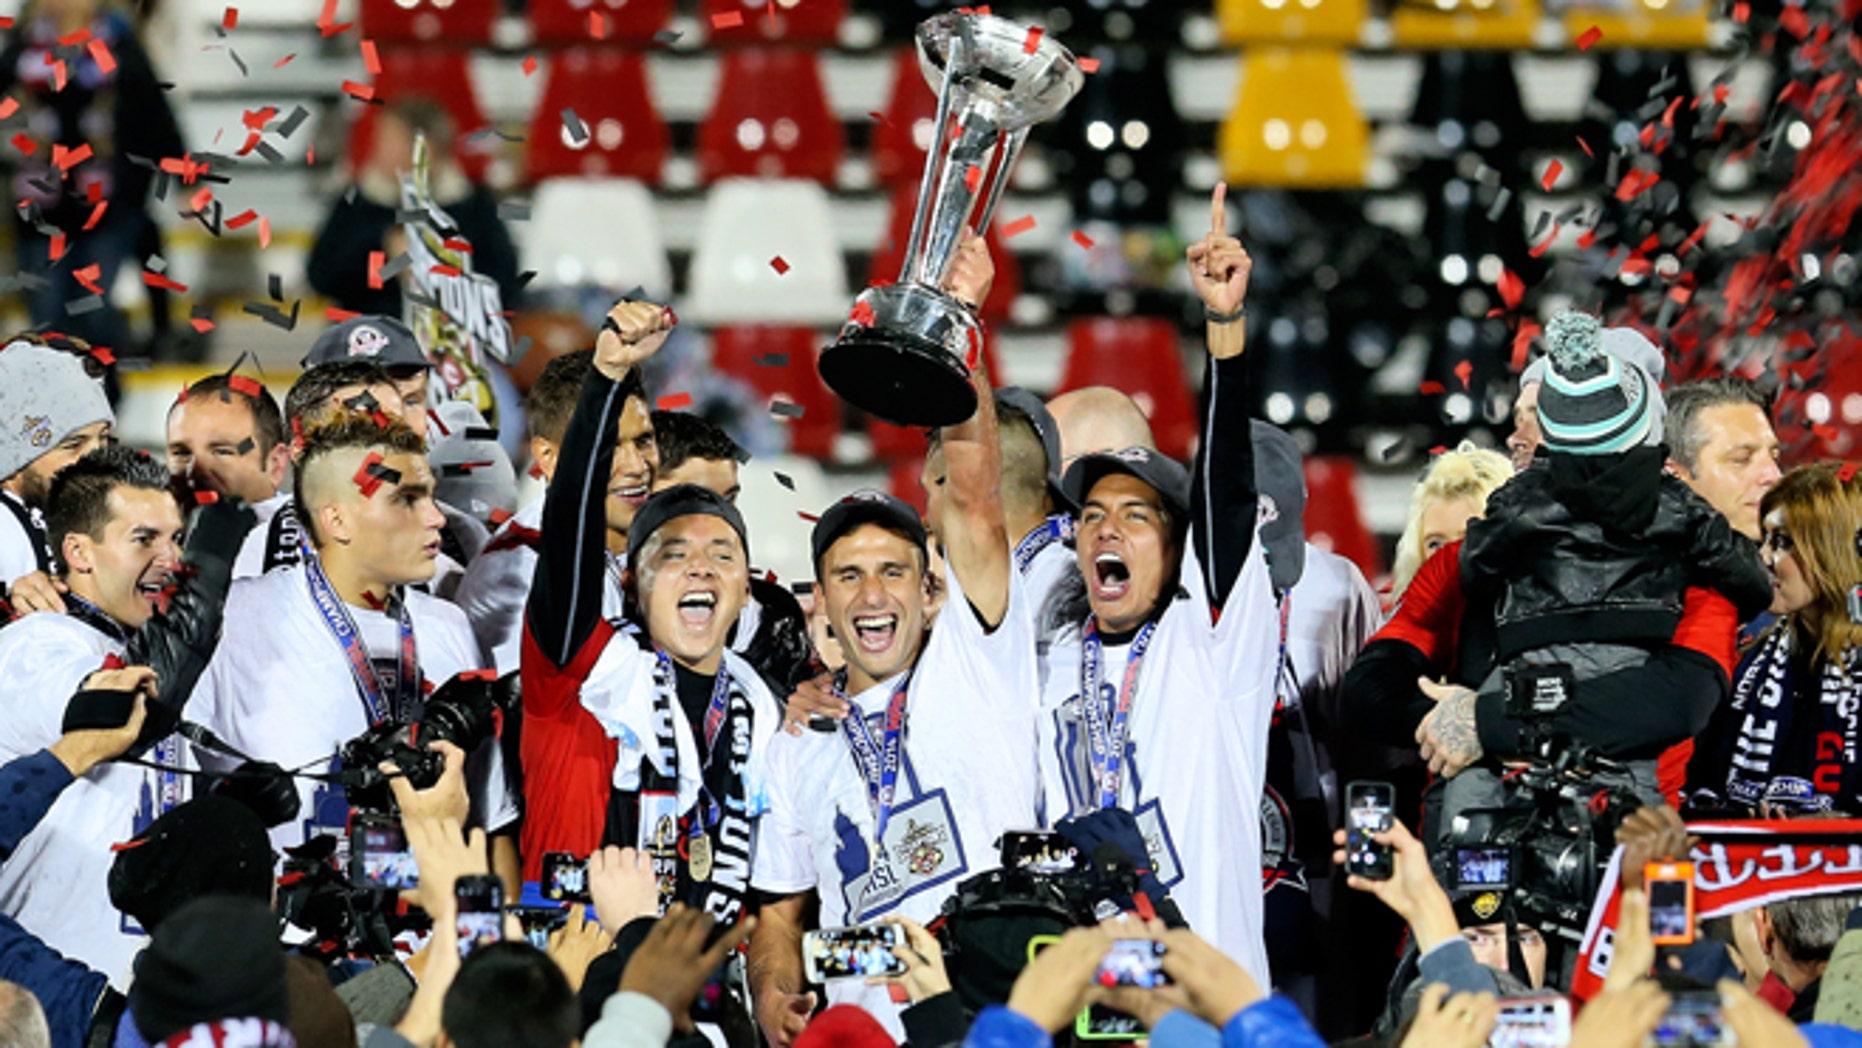 San Antonio Scorpions celebrate their 2014 NASL championship. (Photo: Courtesy NASL)